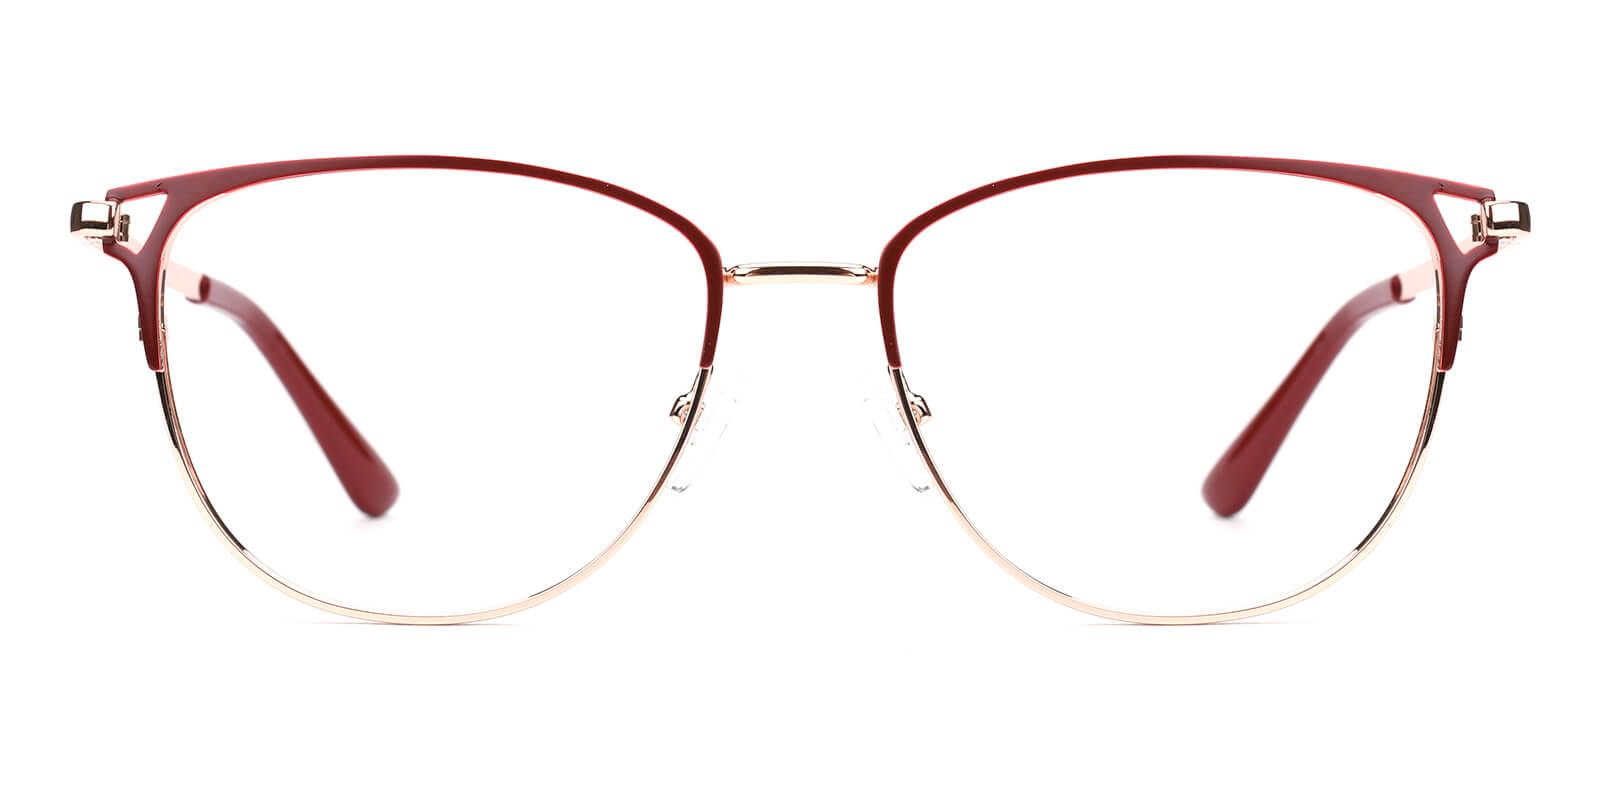 Geraldine-Red-Browline-Metal-Eyeglasses-additional2